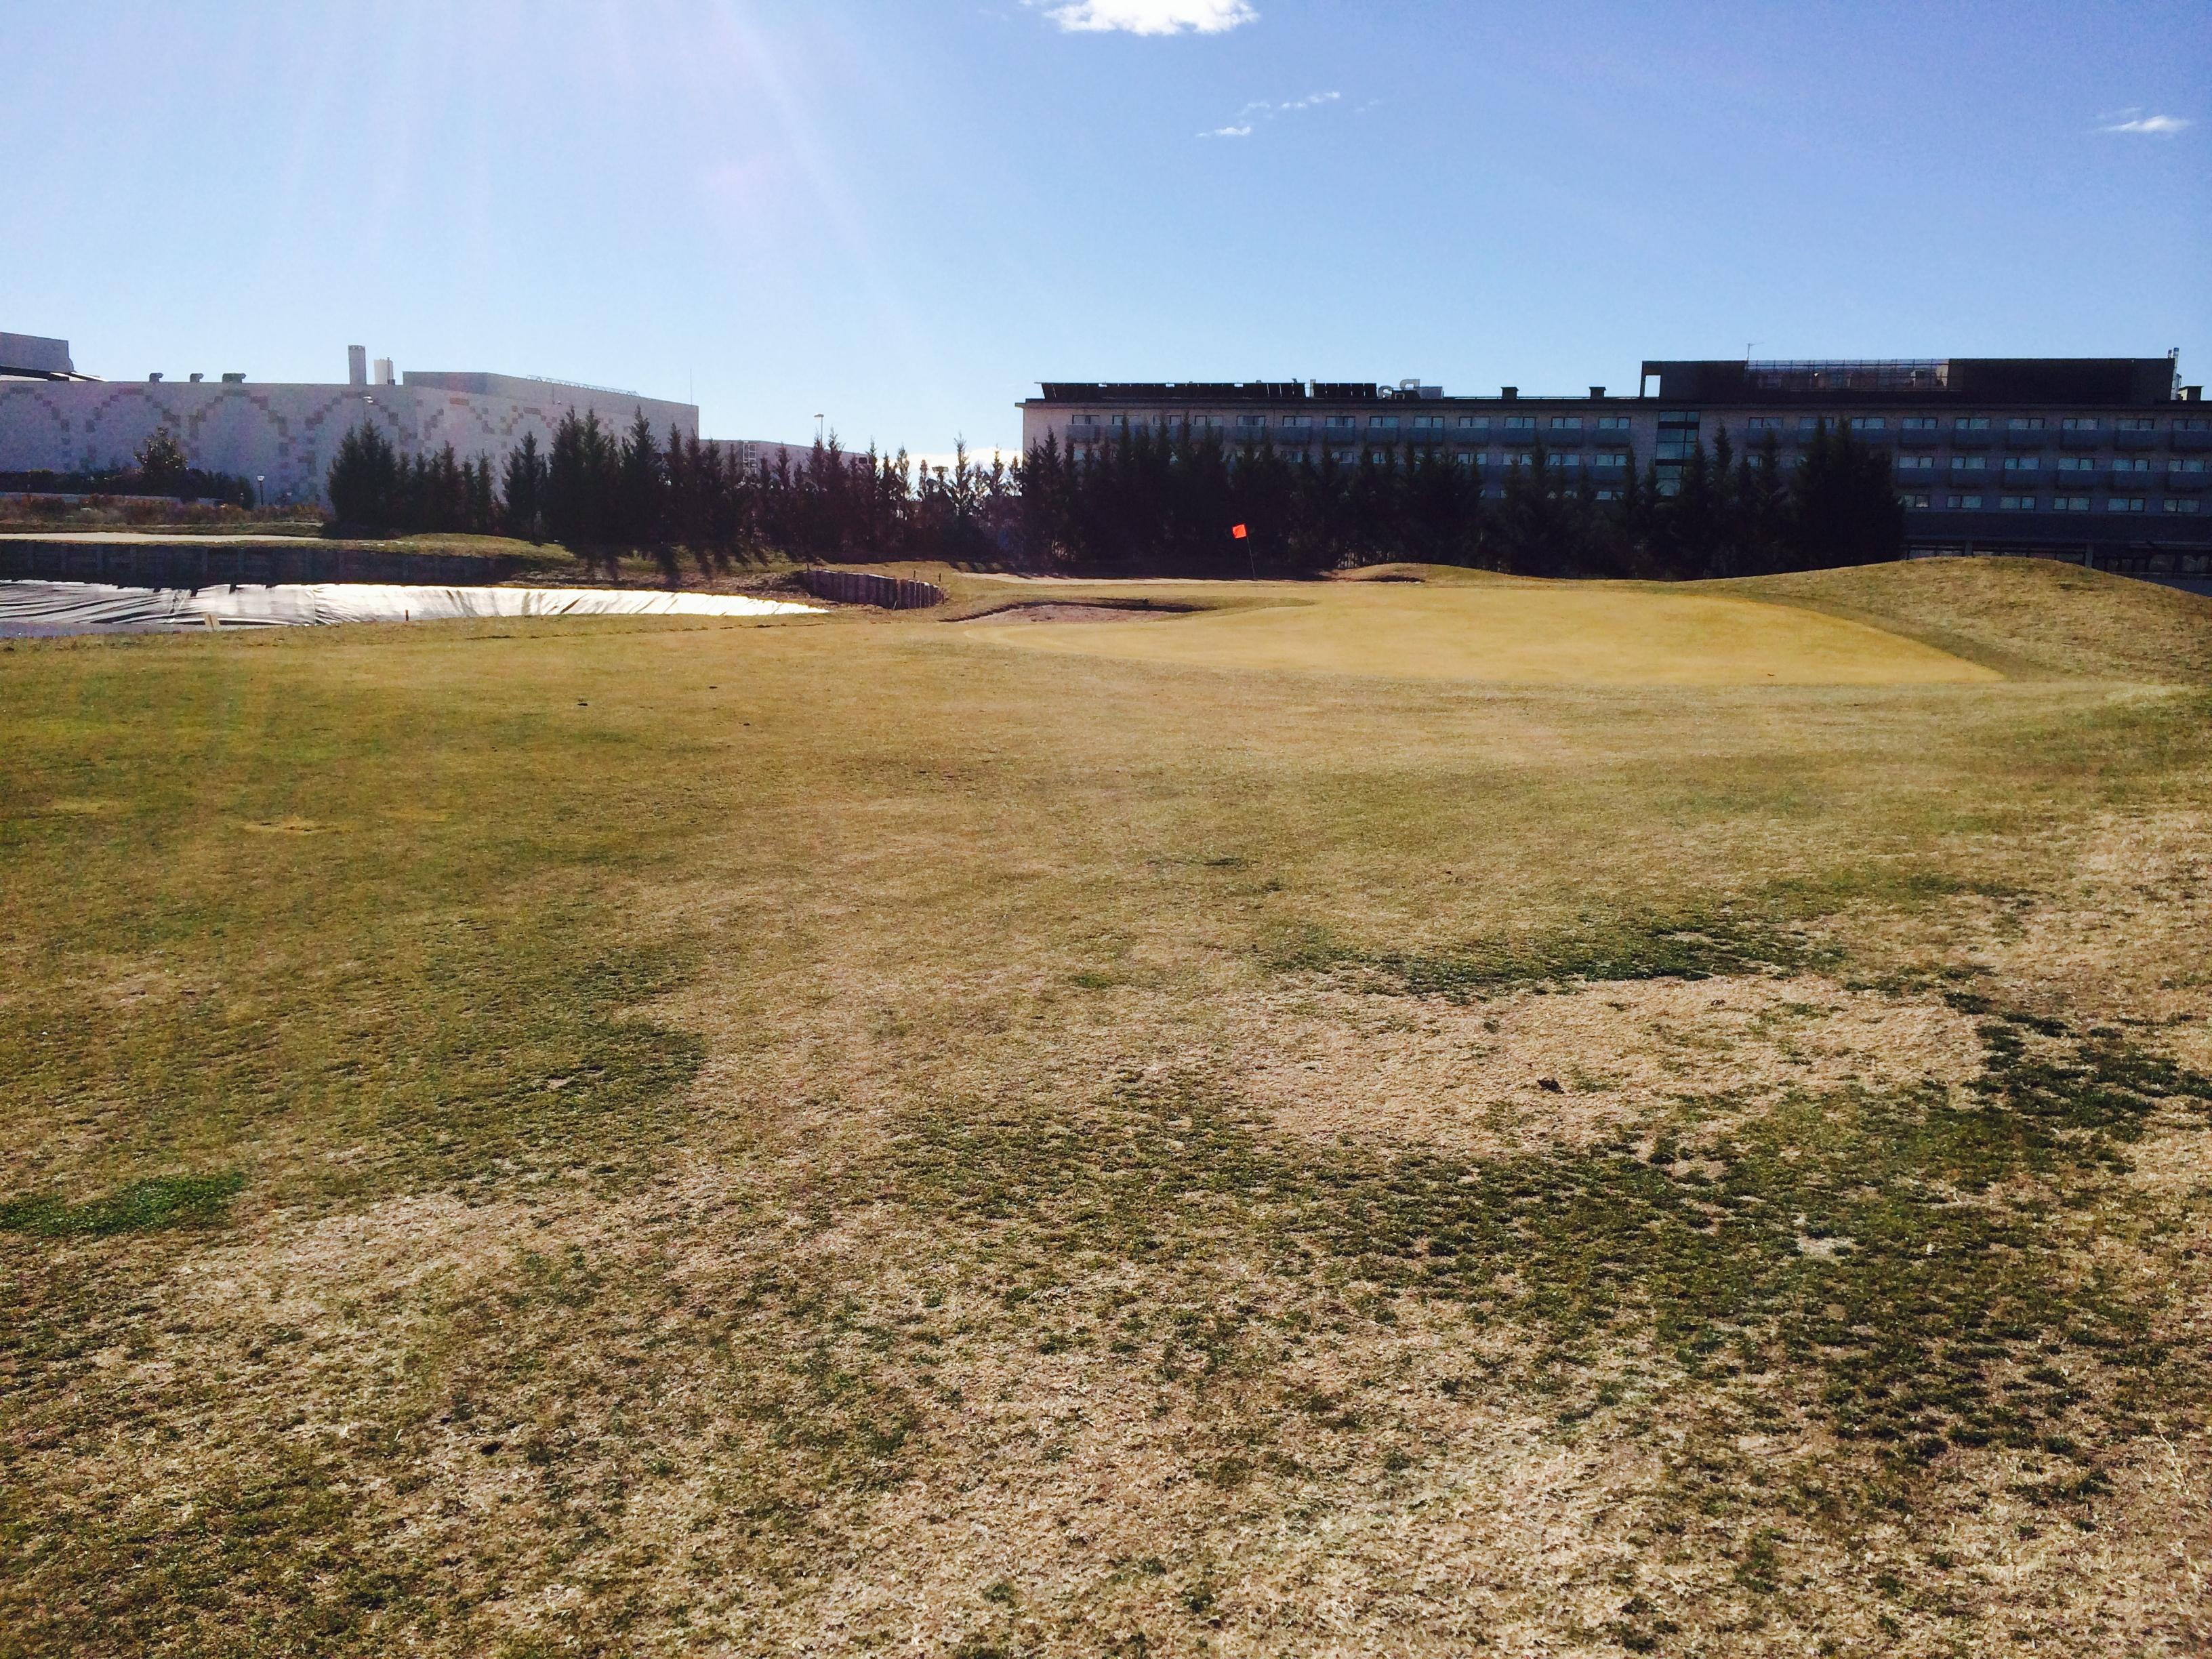 Golf jard n de aranjuez madrid wantes golf for Golf jardin de aranjuez